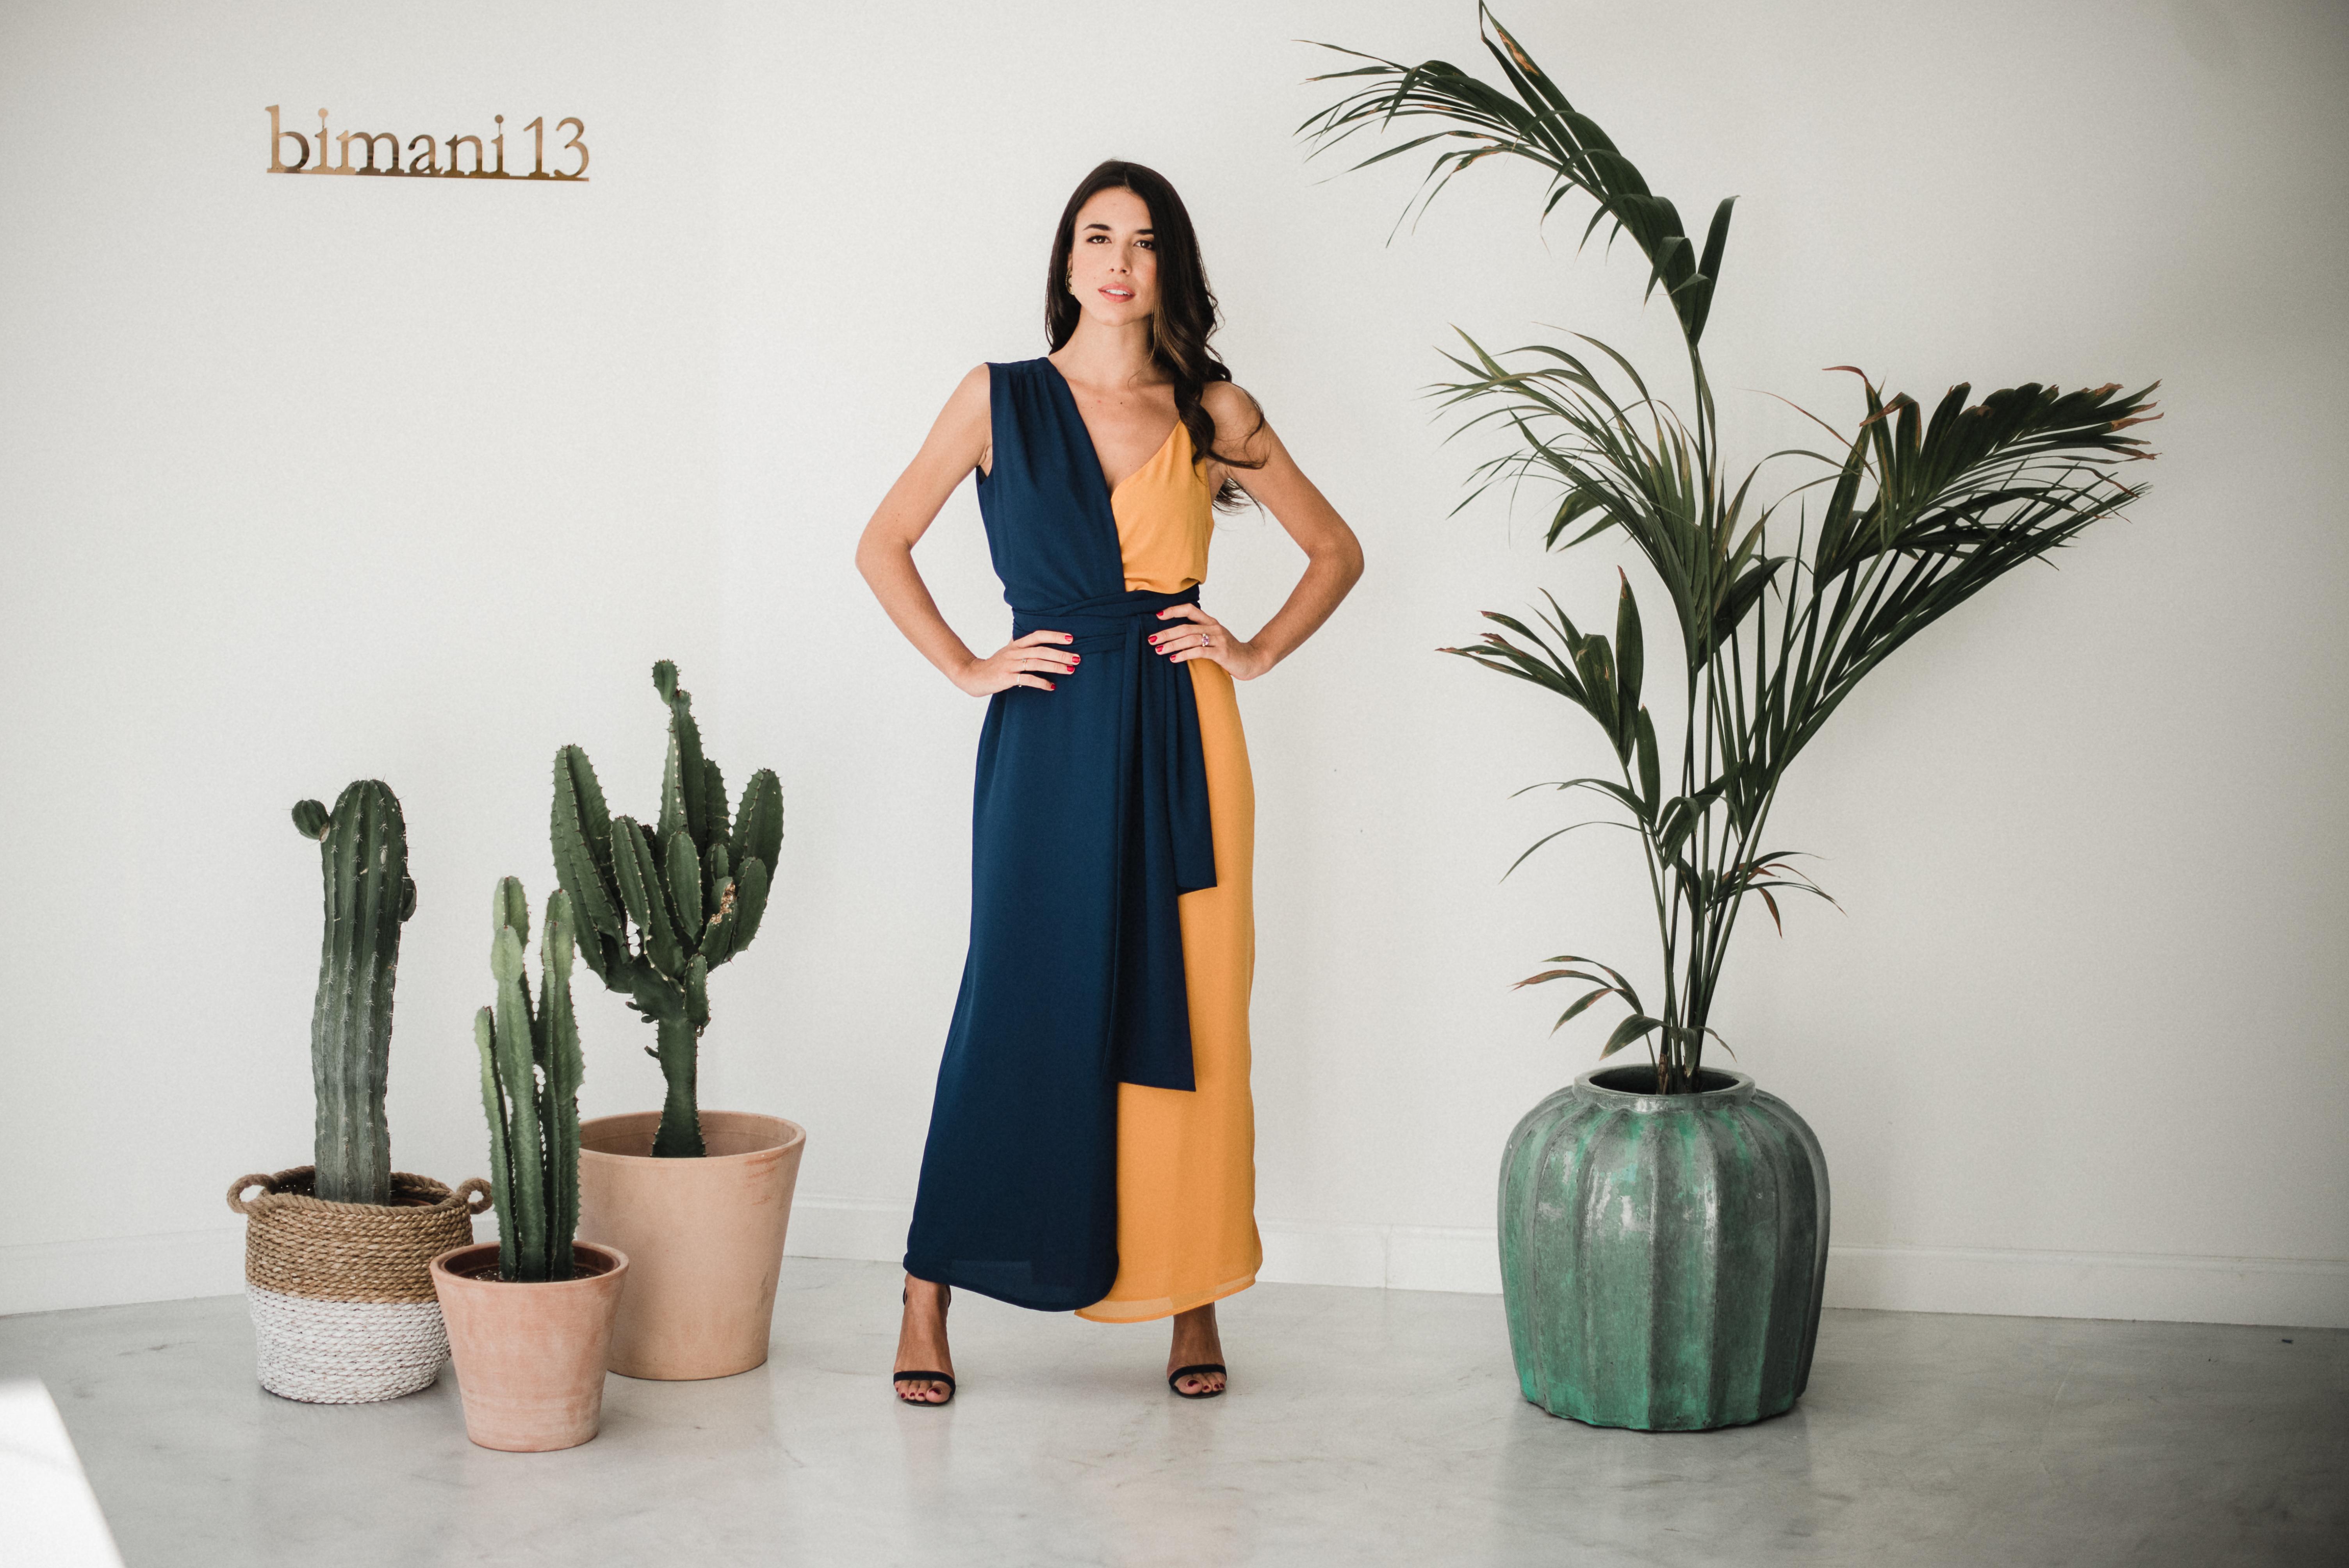 Bimani_13-vestido_bicolor-laura_corsini-blog_de_bodas-wedding_style_magazine